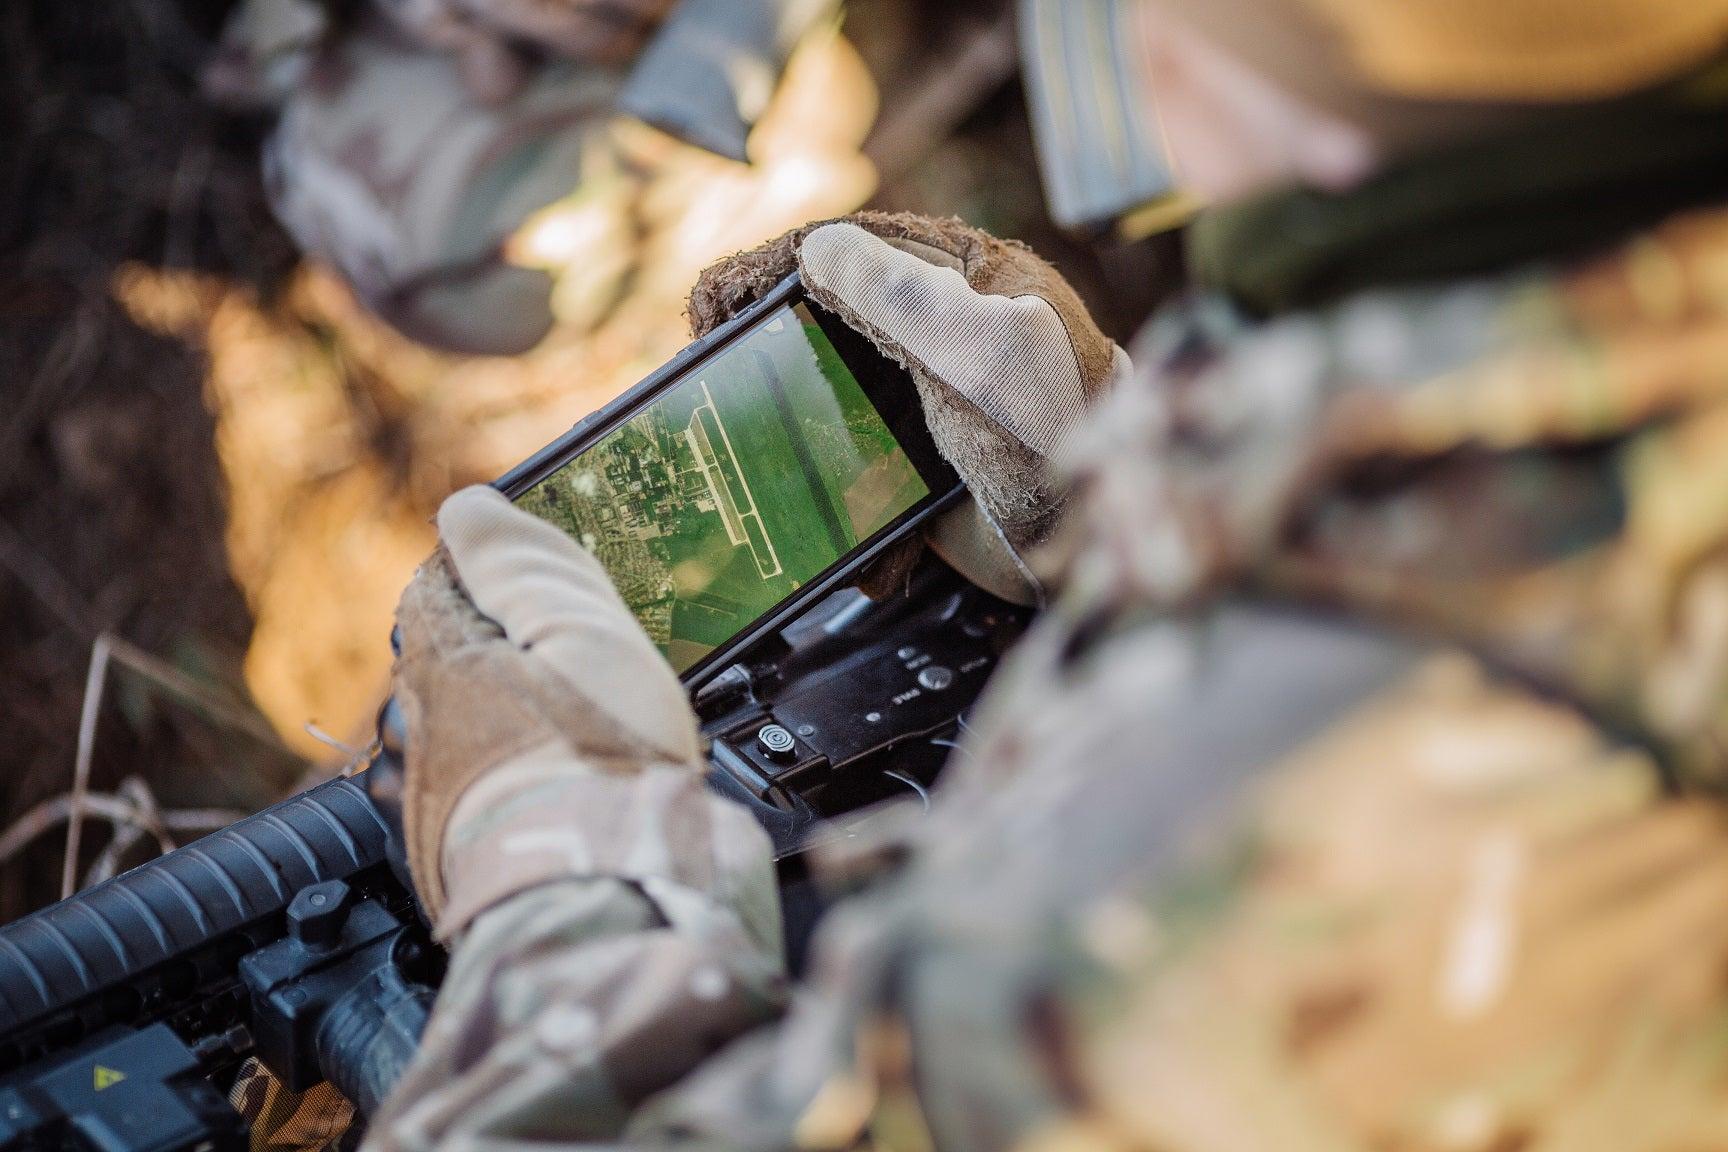 Increasing need for soldier efficiency drives global modernization, says GlobalData